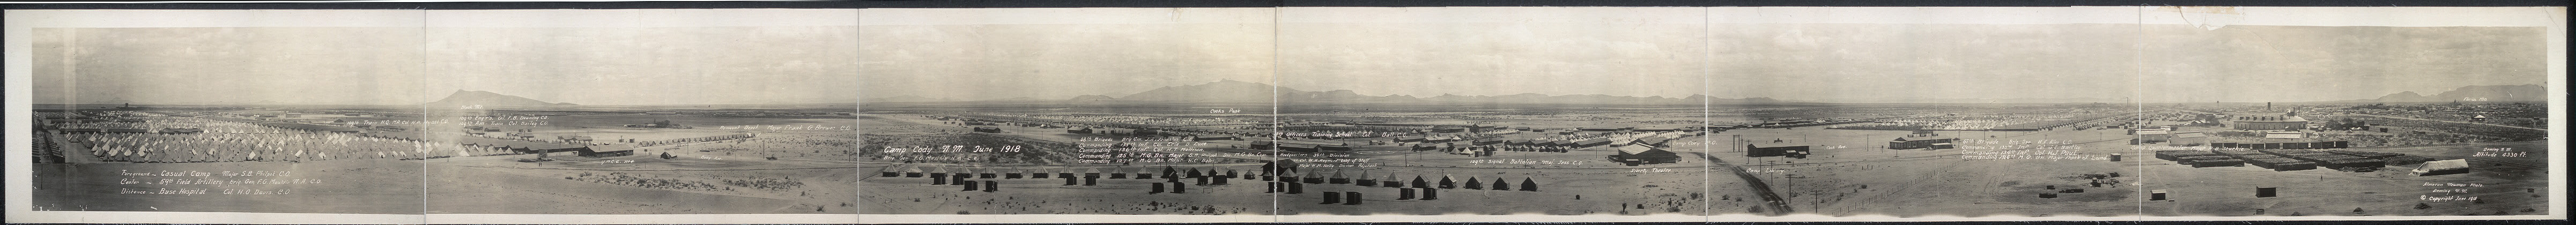 Camp Cody, N.M., June 1918; Brig. Gen. F. G. Mauldin, N.A. C.O.